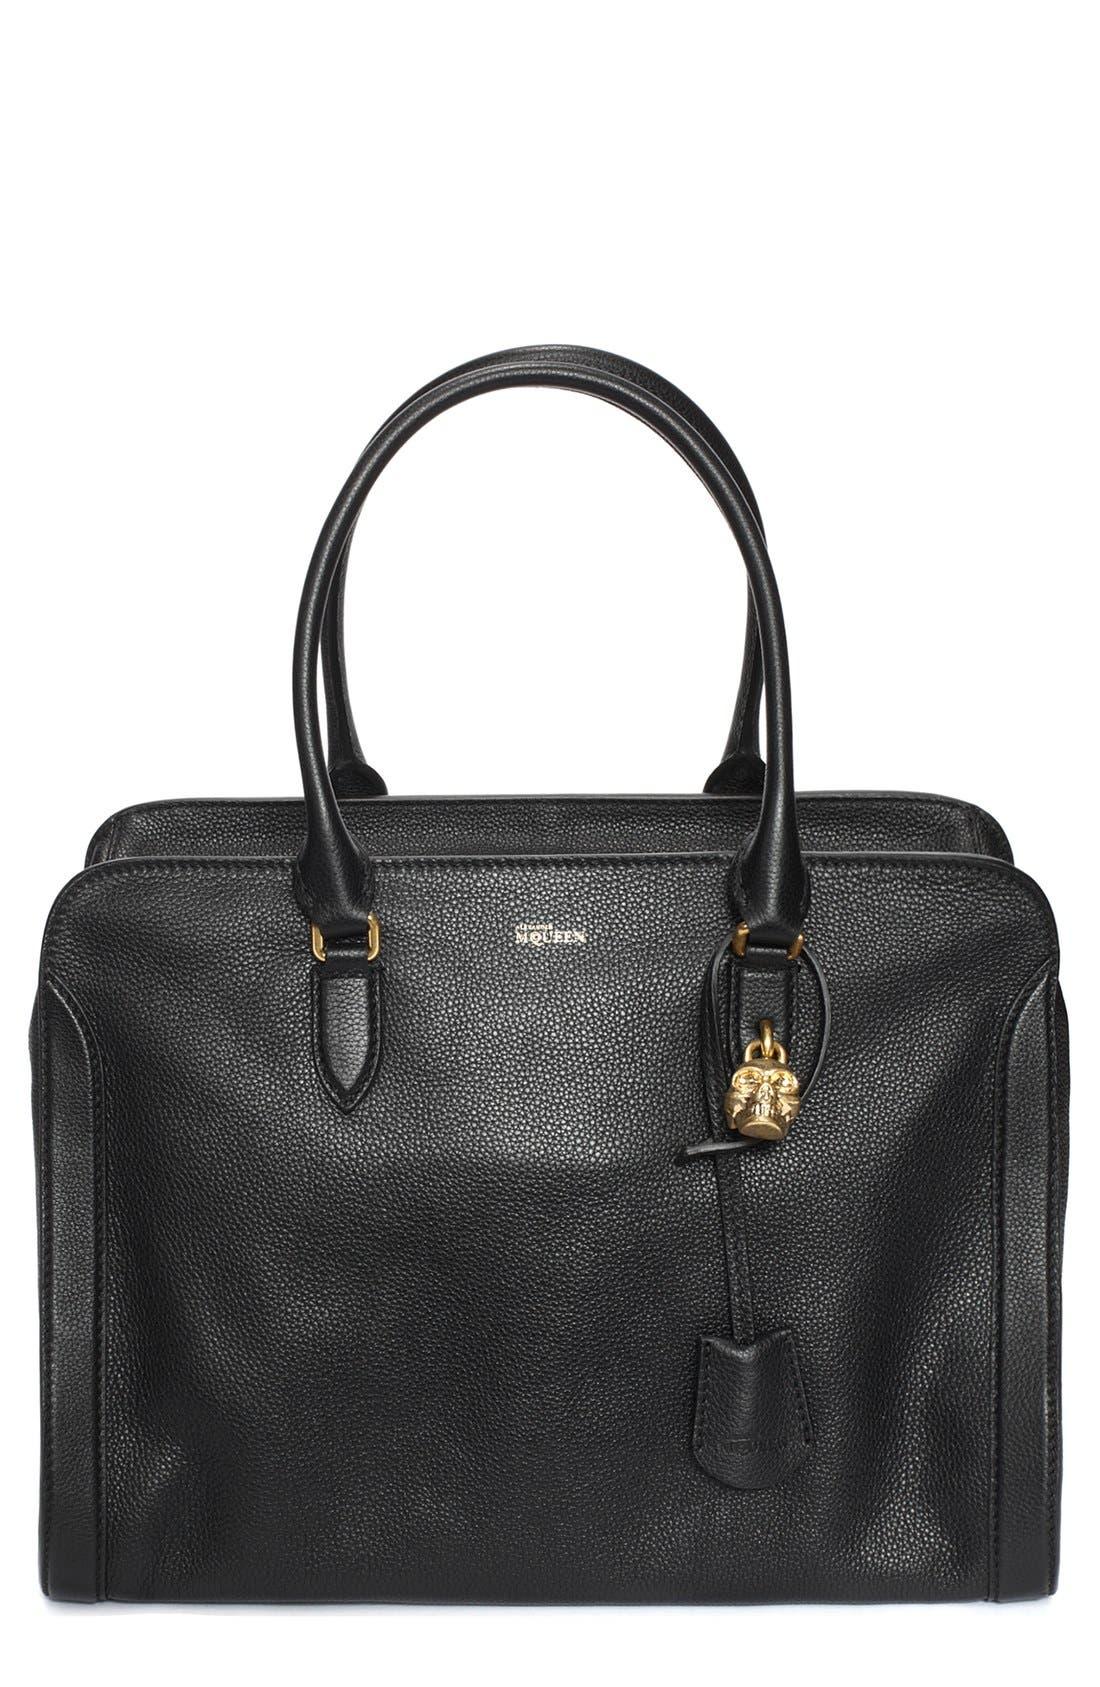 Main Image - Alexander McQueen 'Padlock' Calfskin Leather Duffel Bag